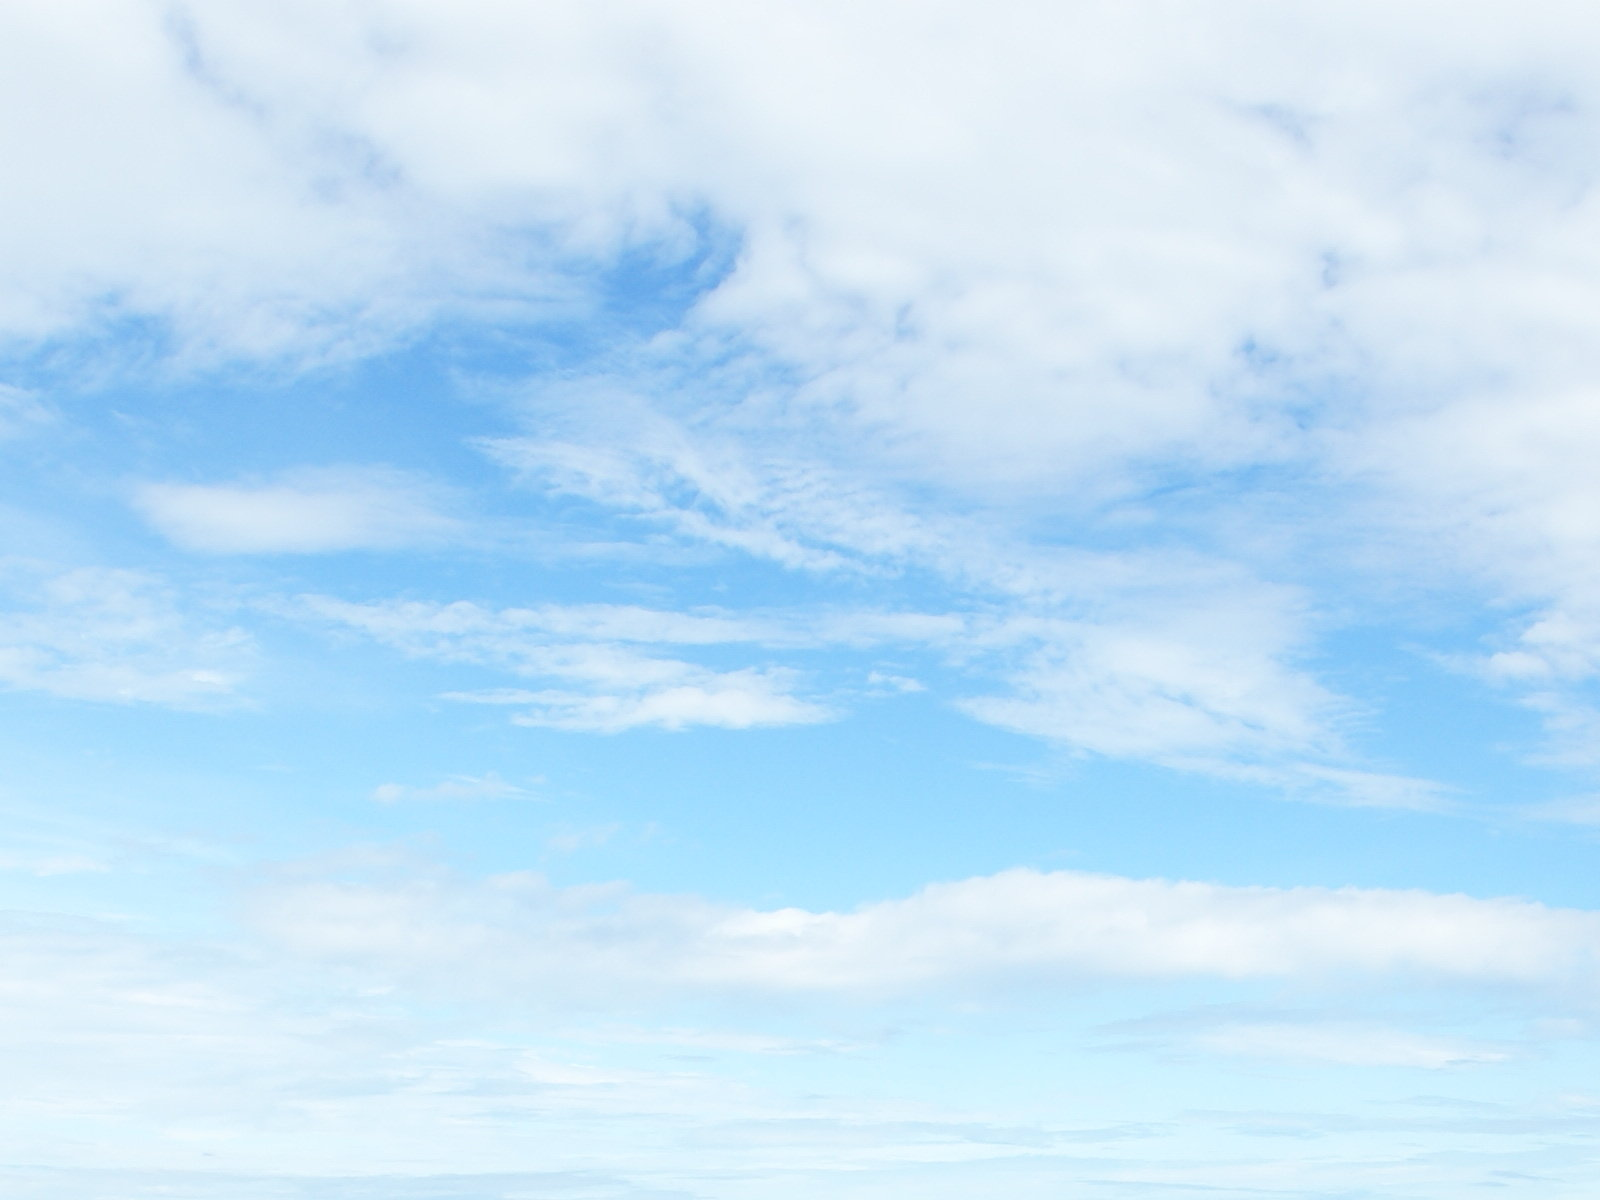 48 Blue Sky Background Wallpaper On Wallpapersafari